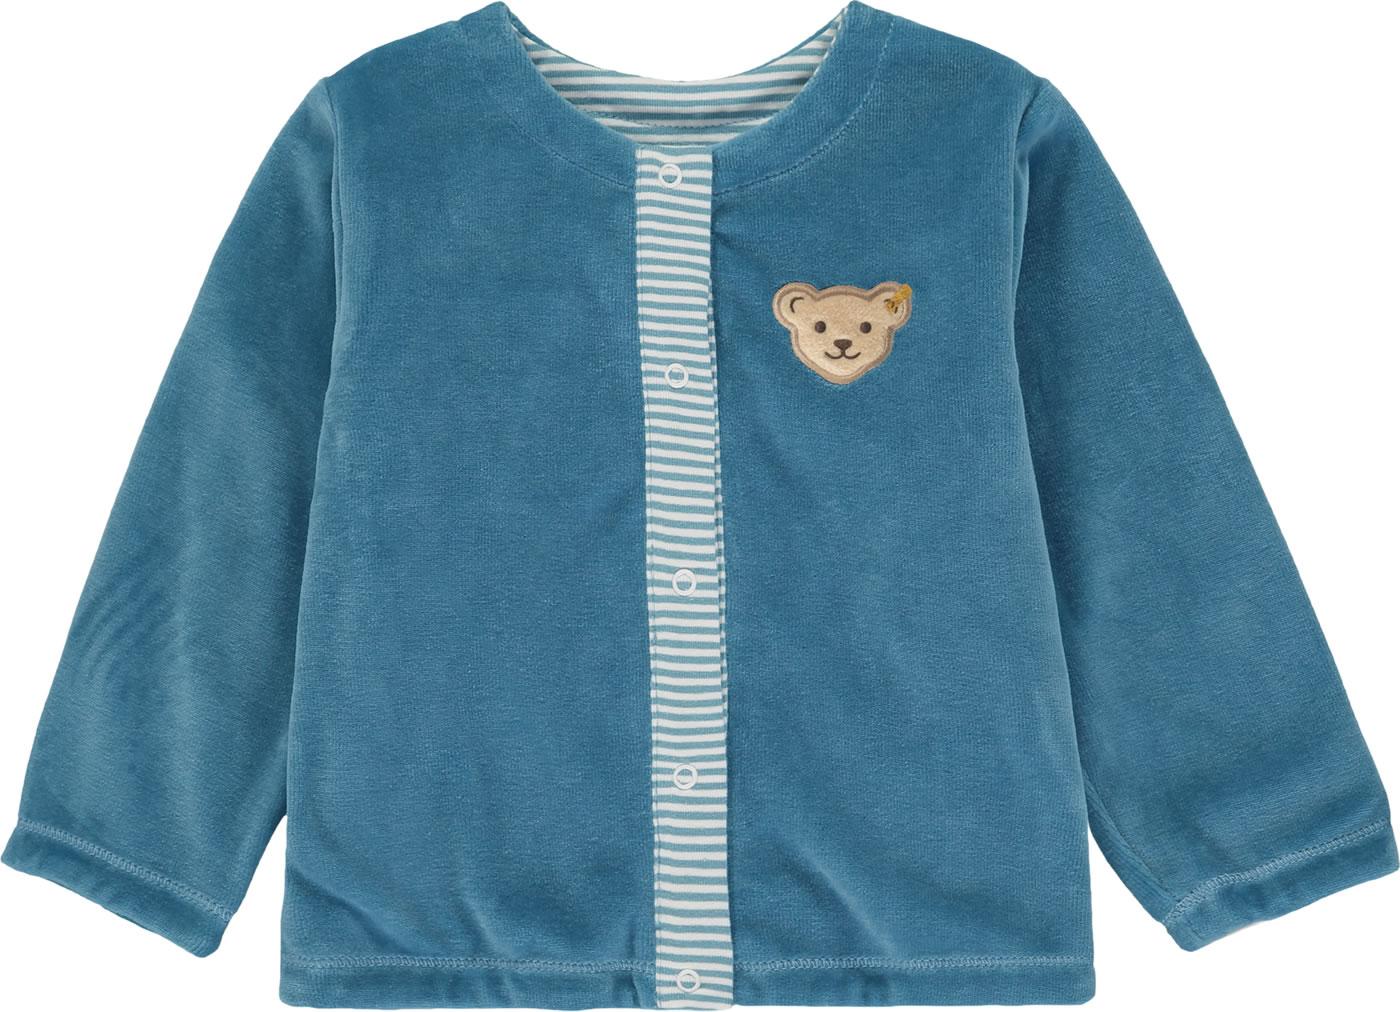 Sanetta Unisex Baby Jacket Reversible Sweatjacke